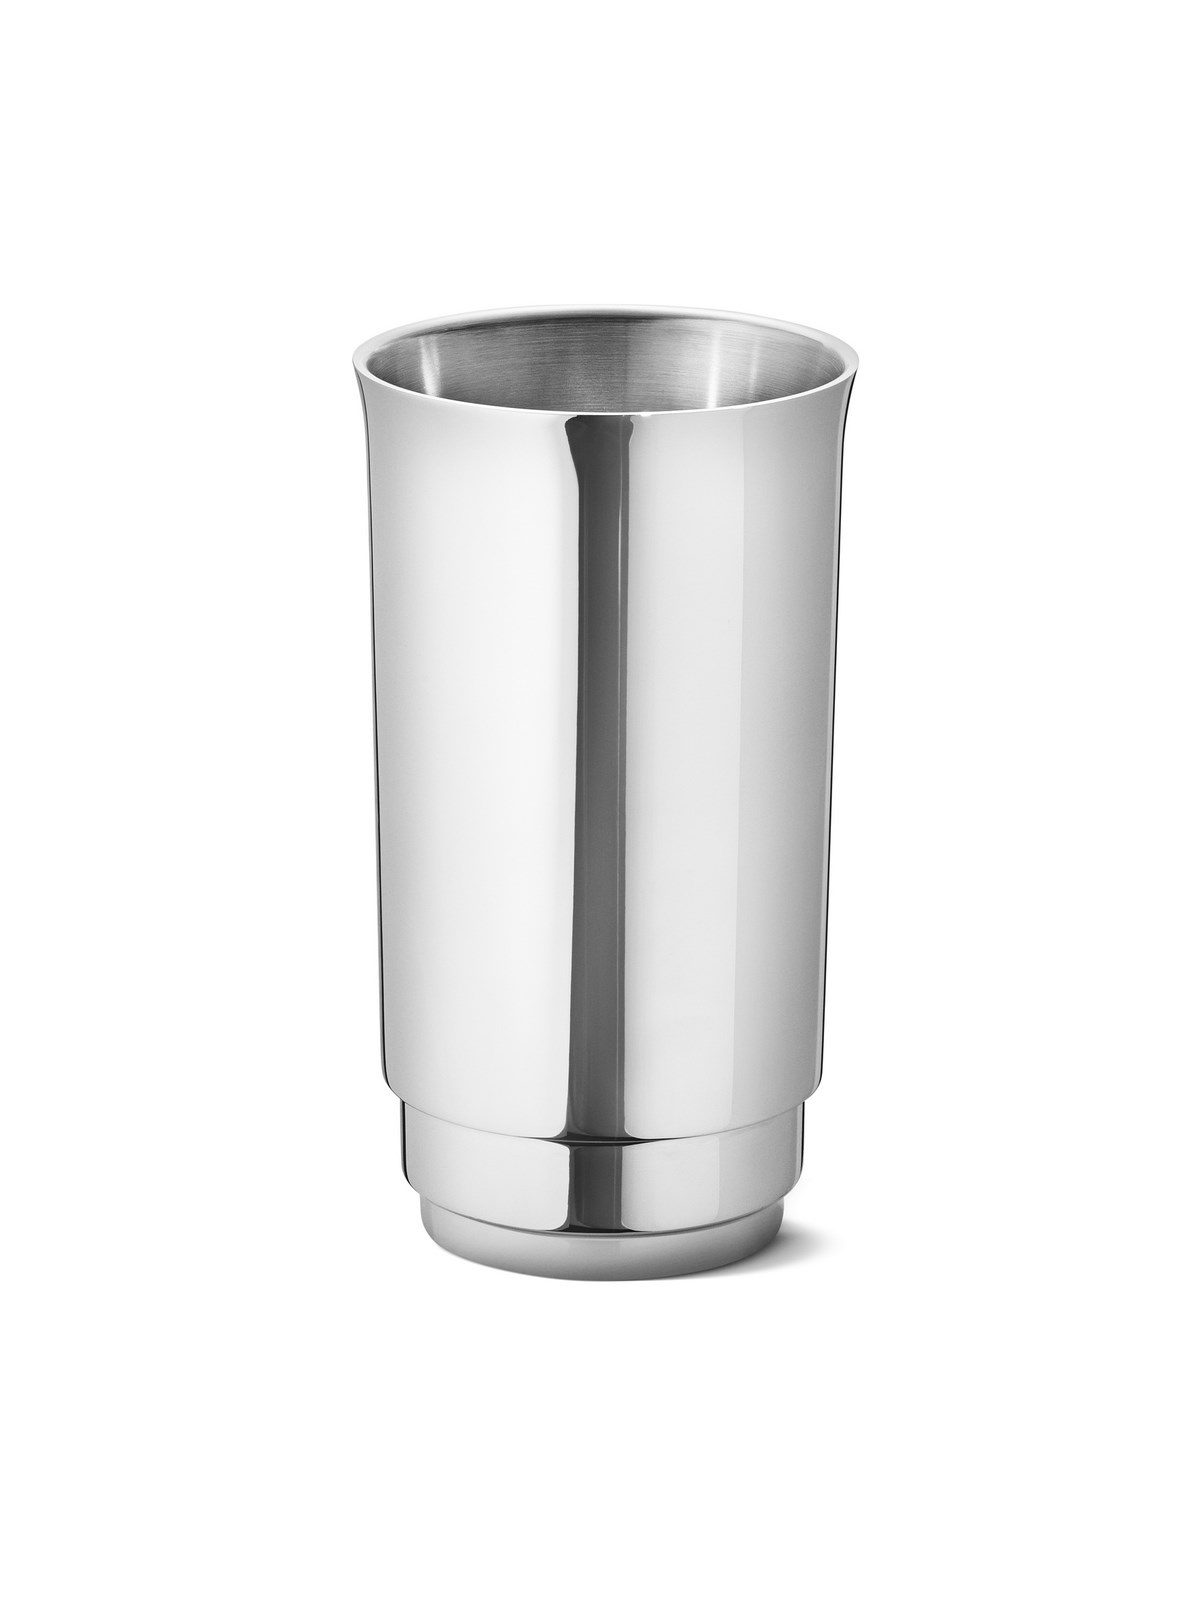 Georg Jensen Manhattan vinkøler, 20 cm, stål